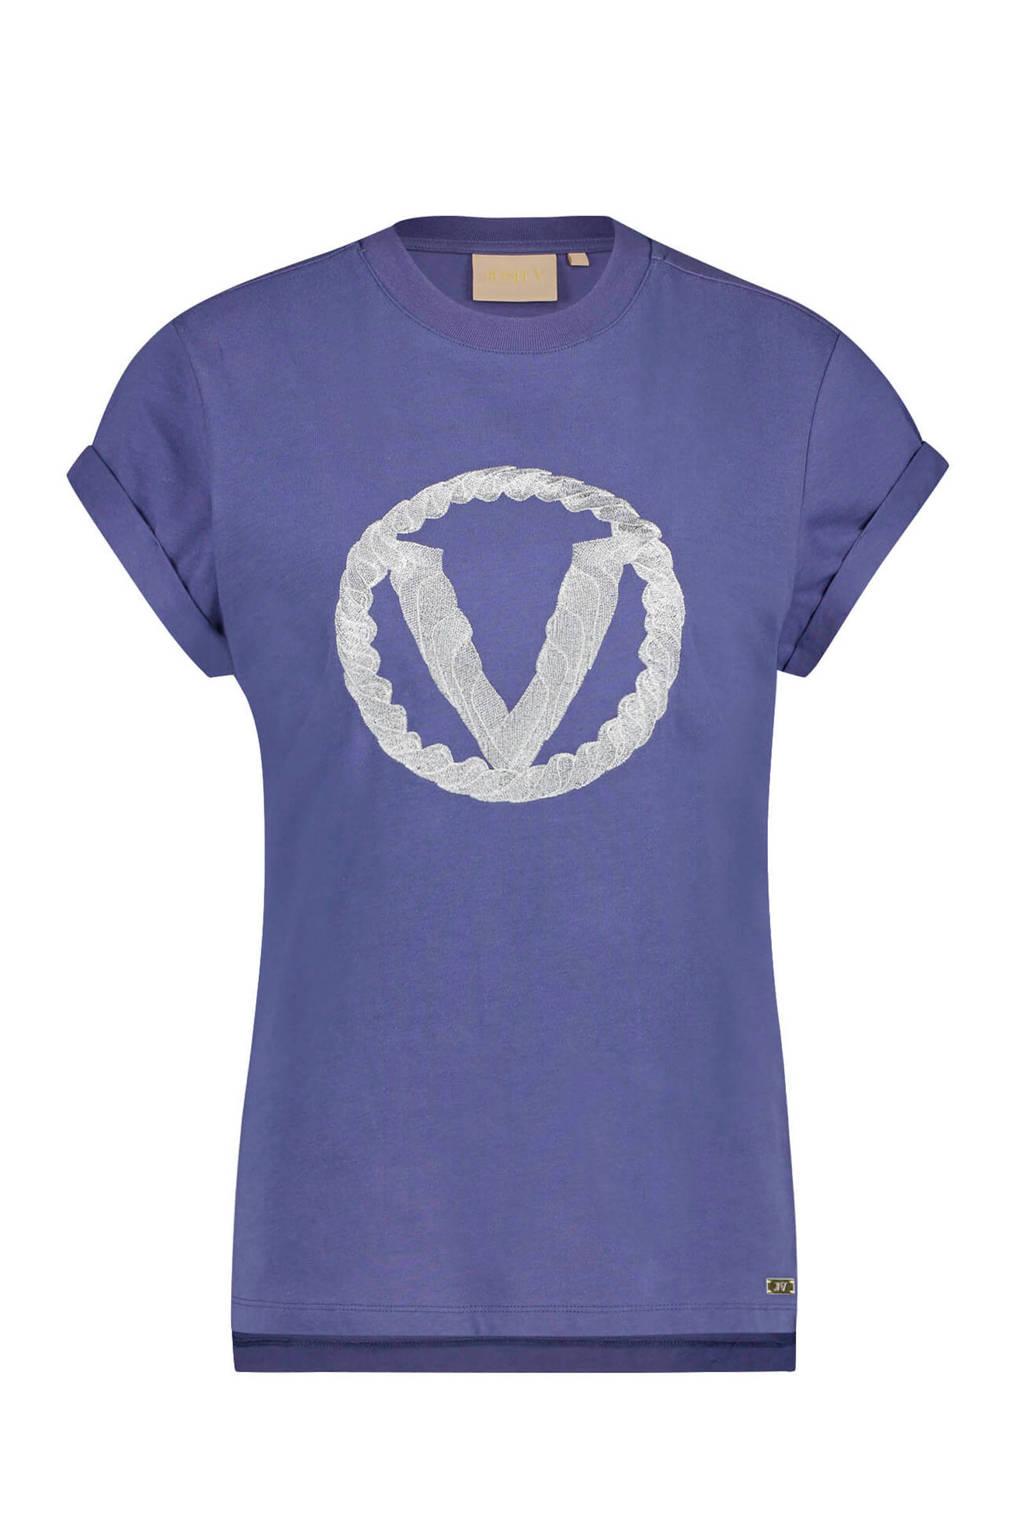 JOSH V Dora T-shirt paarsblauw, Paarsblauw